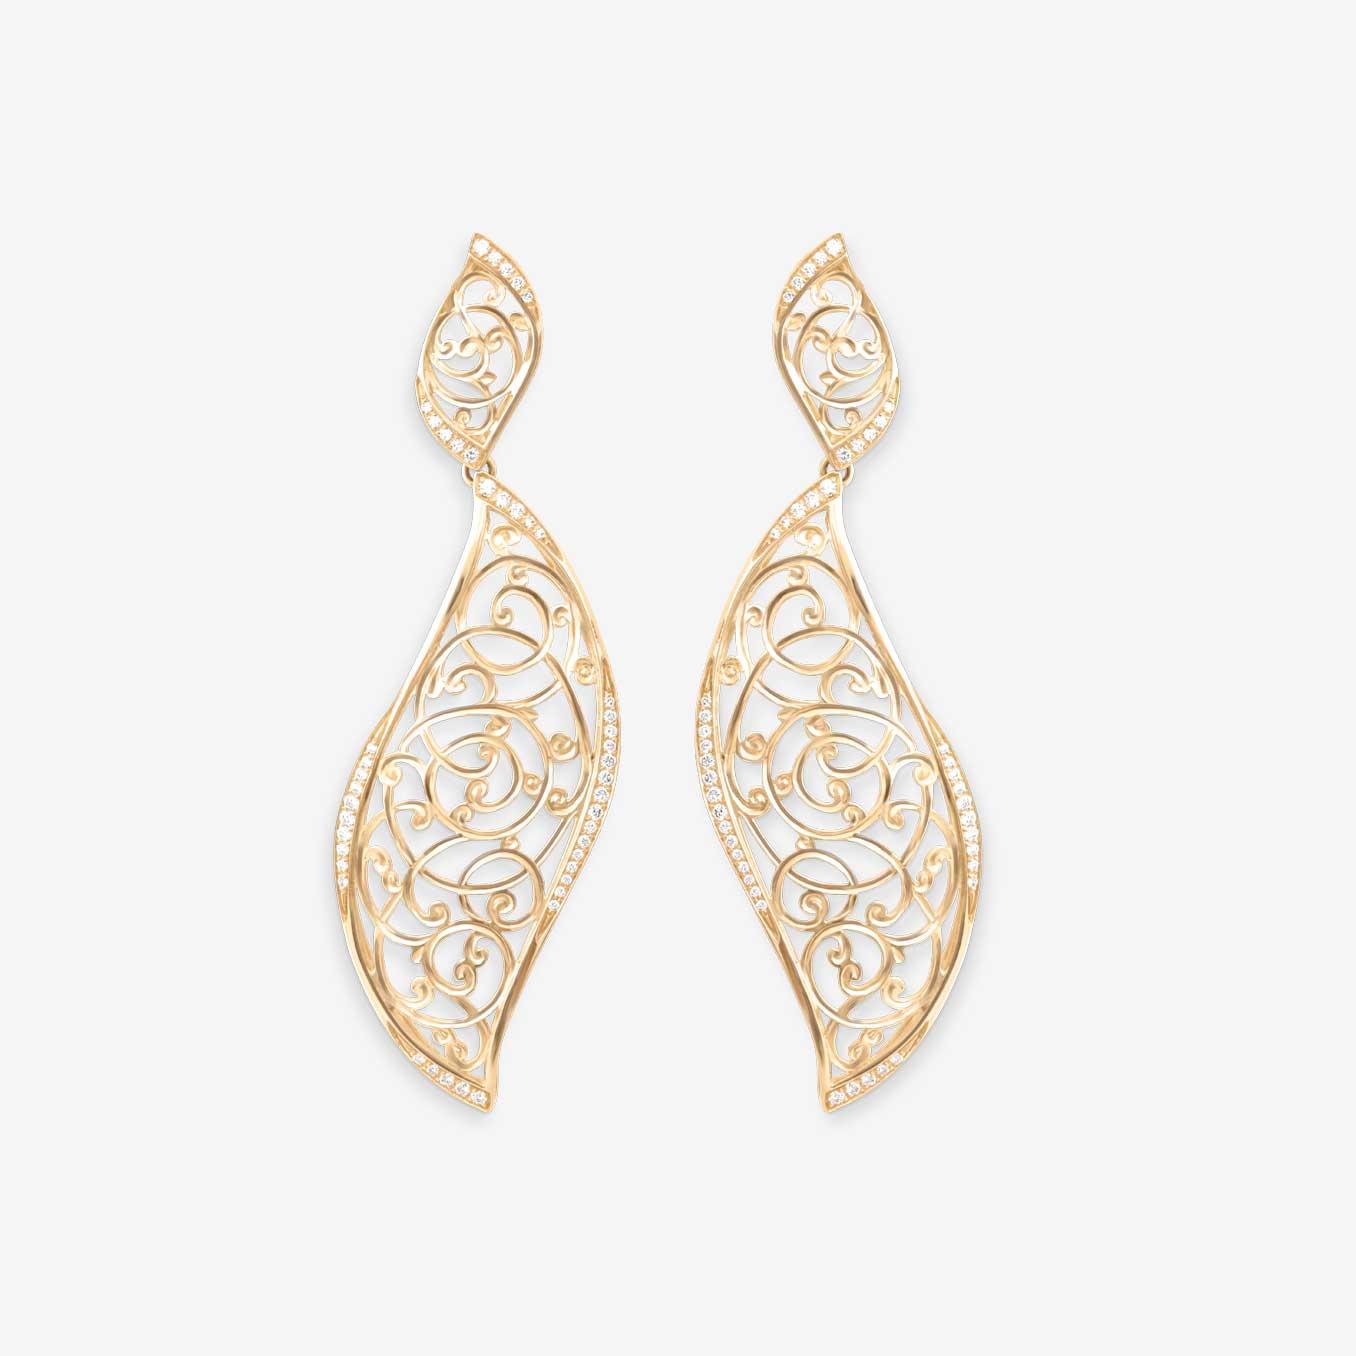 neo-beldi-en-or-jaune-18-carats-et-diamants-Bijouterie-traditionnell